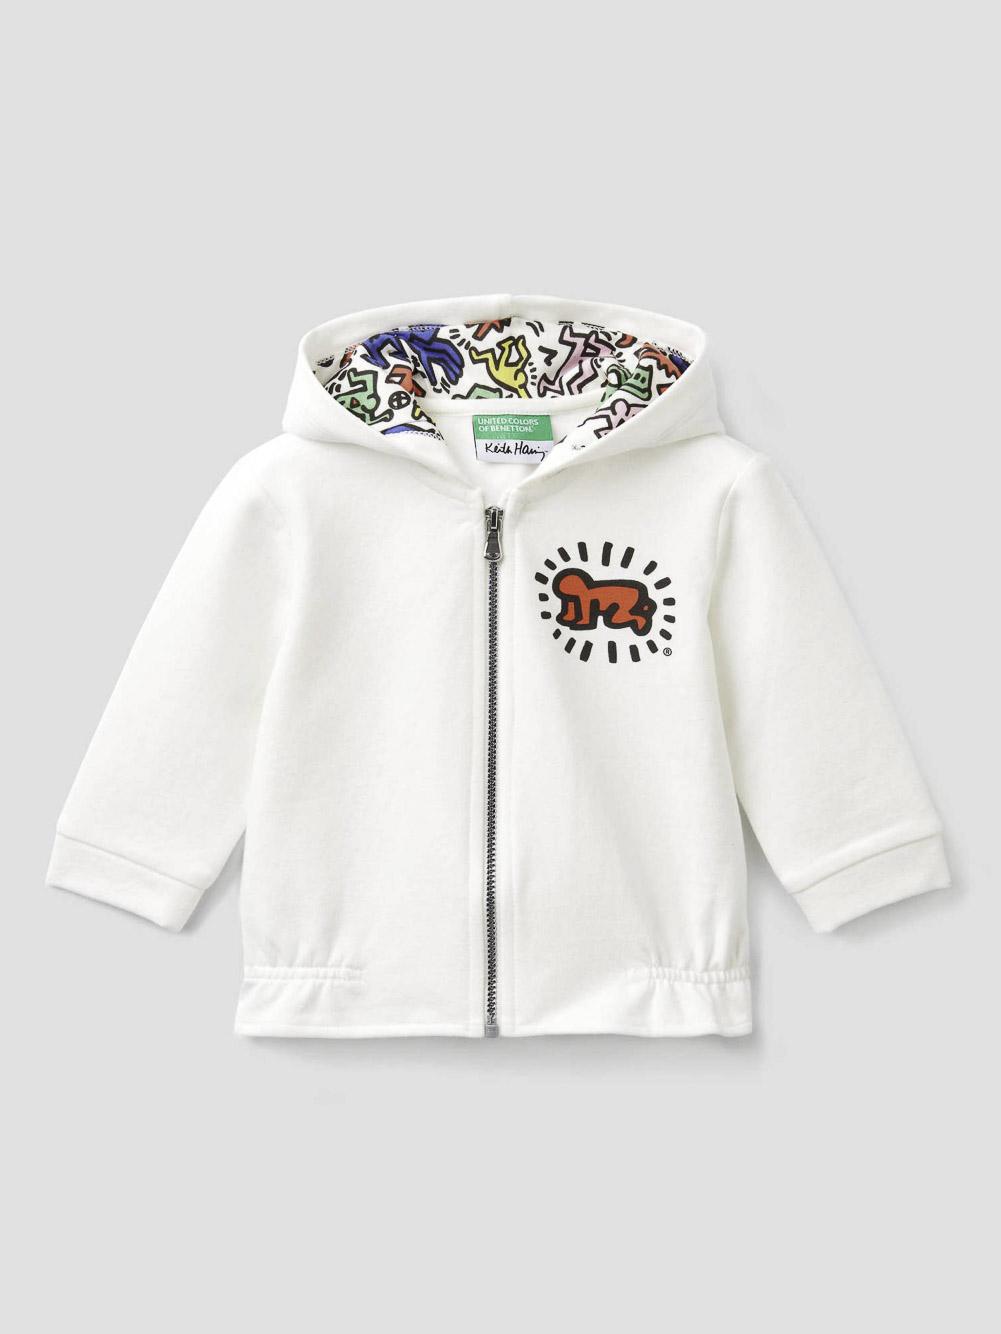 "012 BENETTON Φούτερ με τυπώματα ""Keith Haring"" 3PNMC5868 20A074"